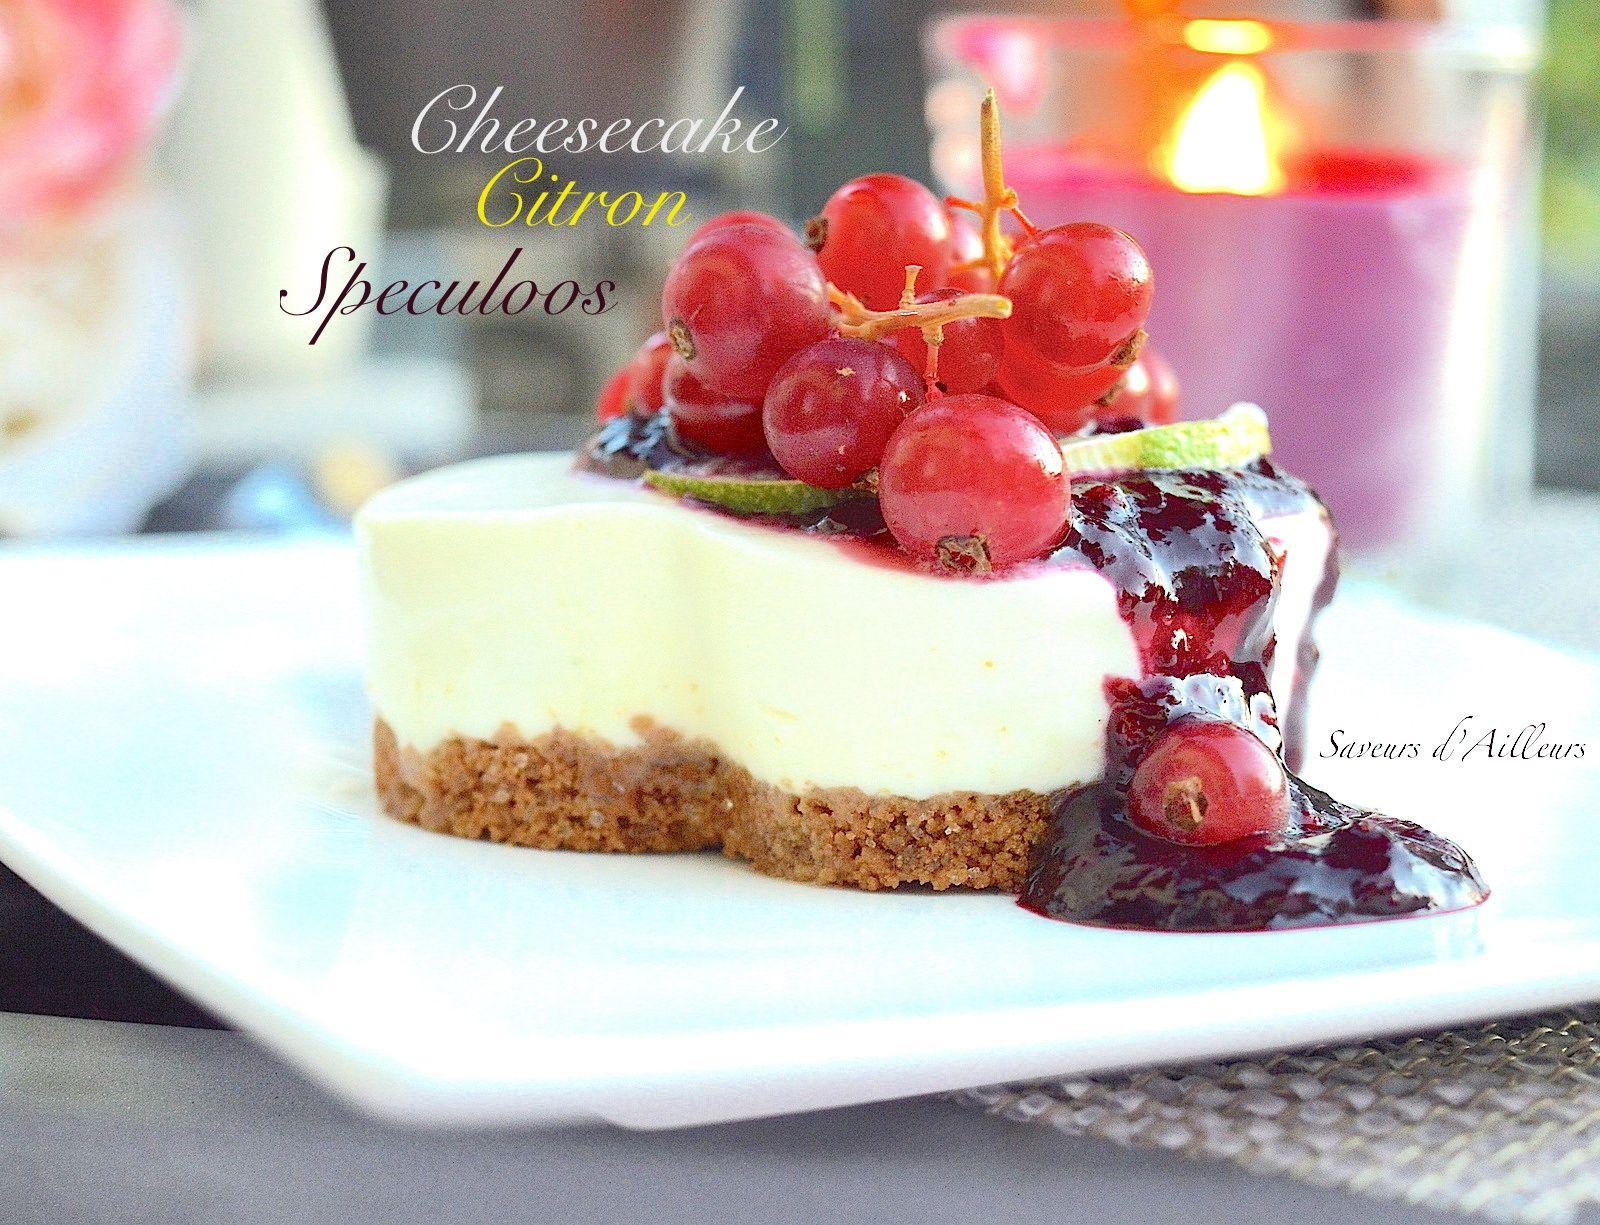 Cheesecake au citron vert sur lit de speculoos ...